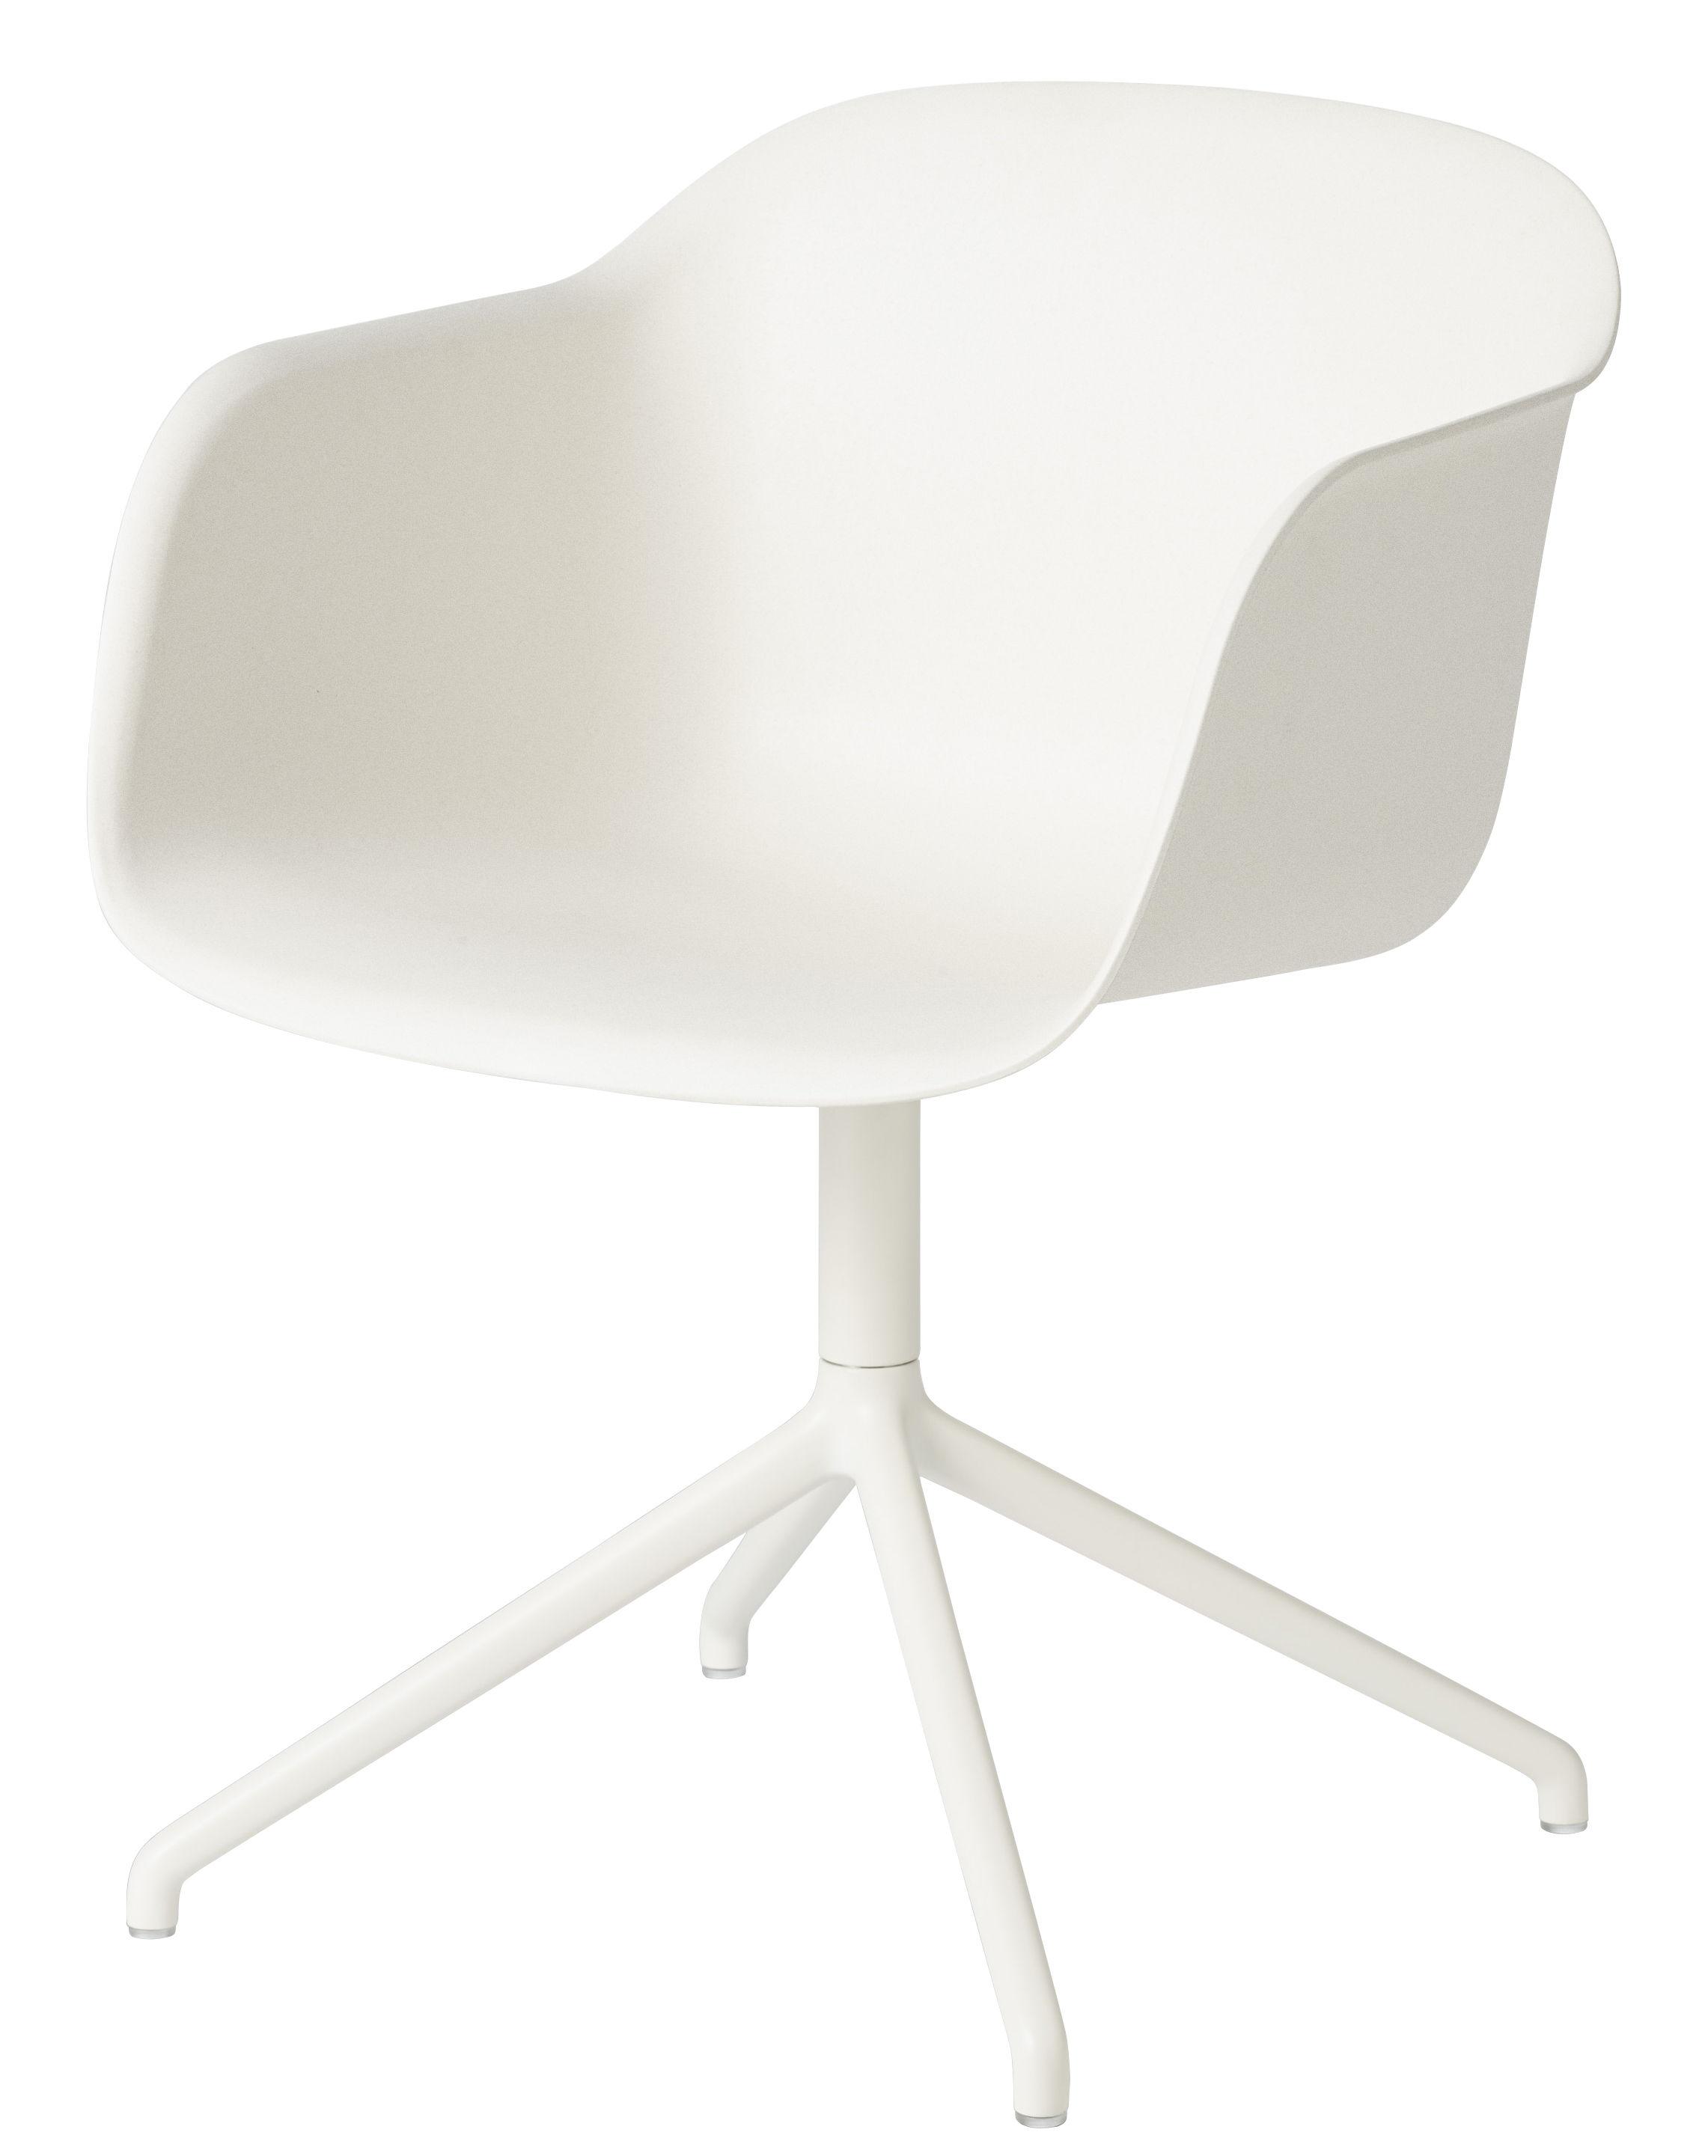 Möbel - Stühle  - Fiber Drehsessel - Muuto - Sitzschale weiß / Fußgestell weiß - bemalter Stahl, Recyceltes Verbundmaterial